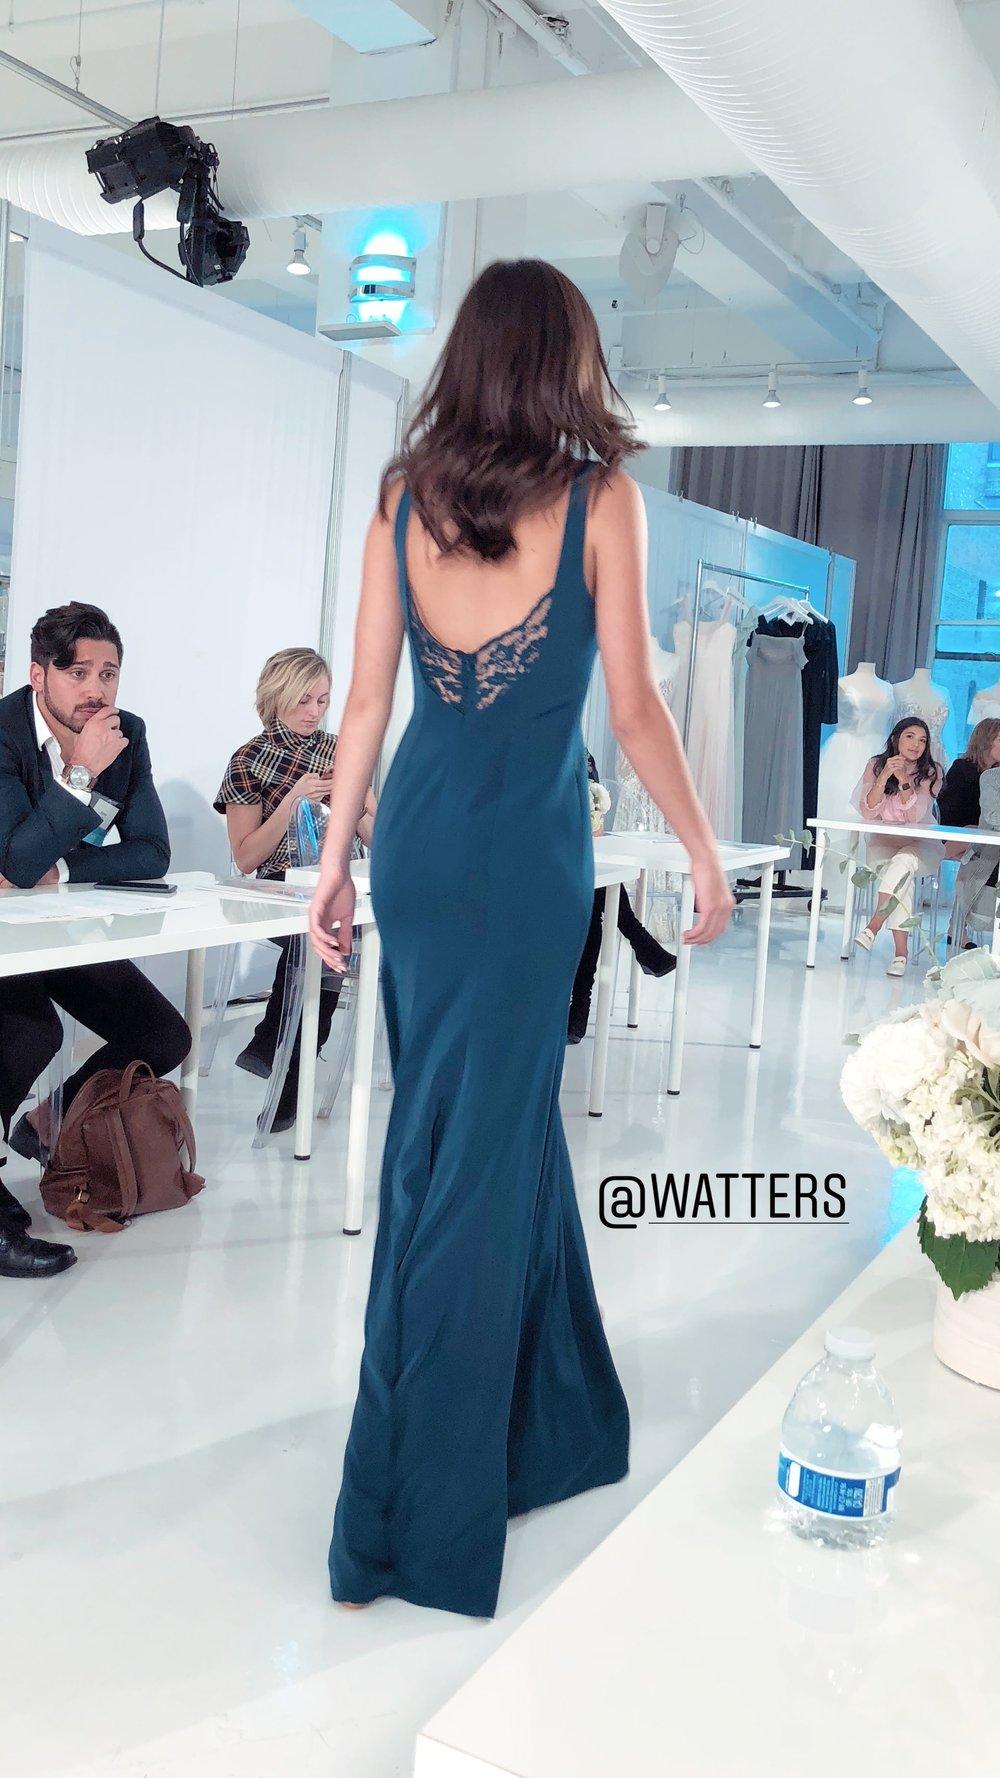 Watters debuts more crepe and lace combos at NYBFW